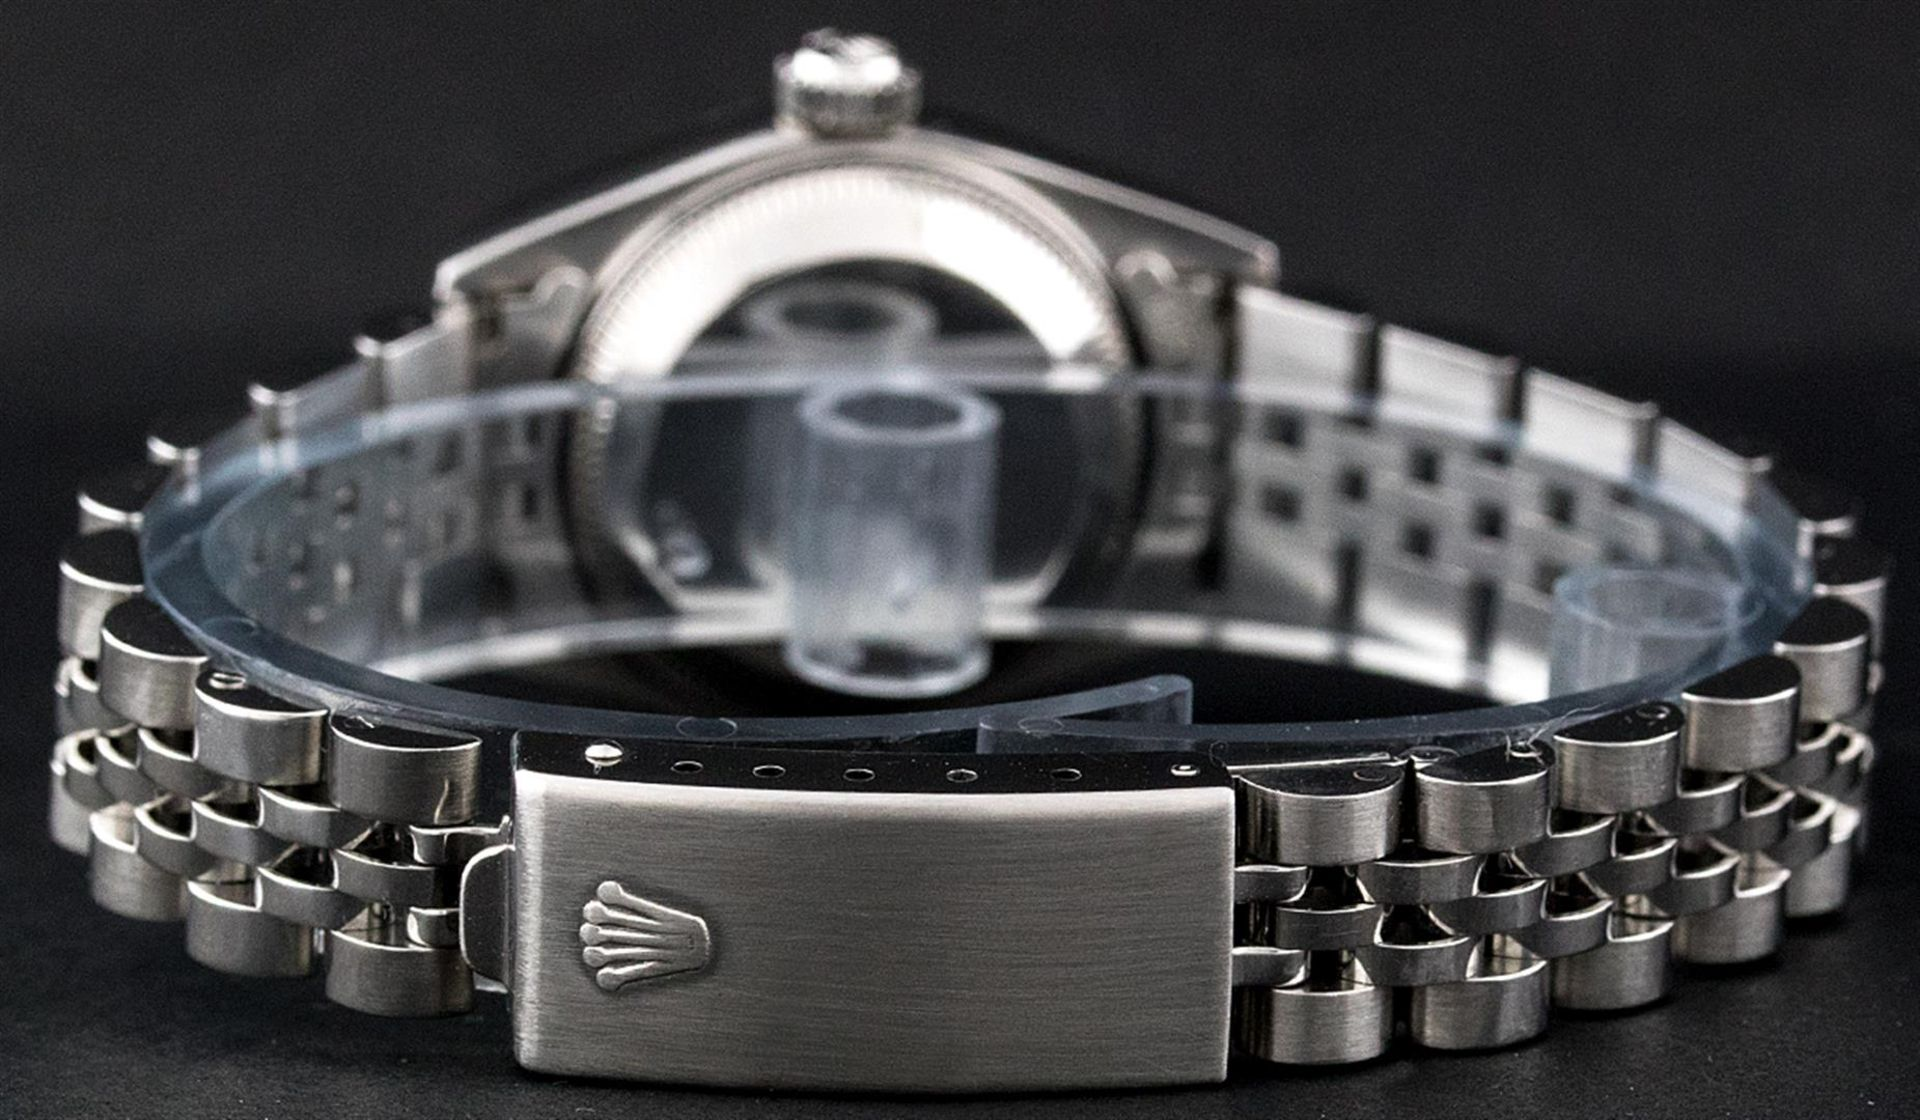 Rolex Ladies Stainless Steel Silver Index 26MM Quickset Datejust Wristwatch - Image 6 of 9